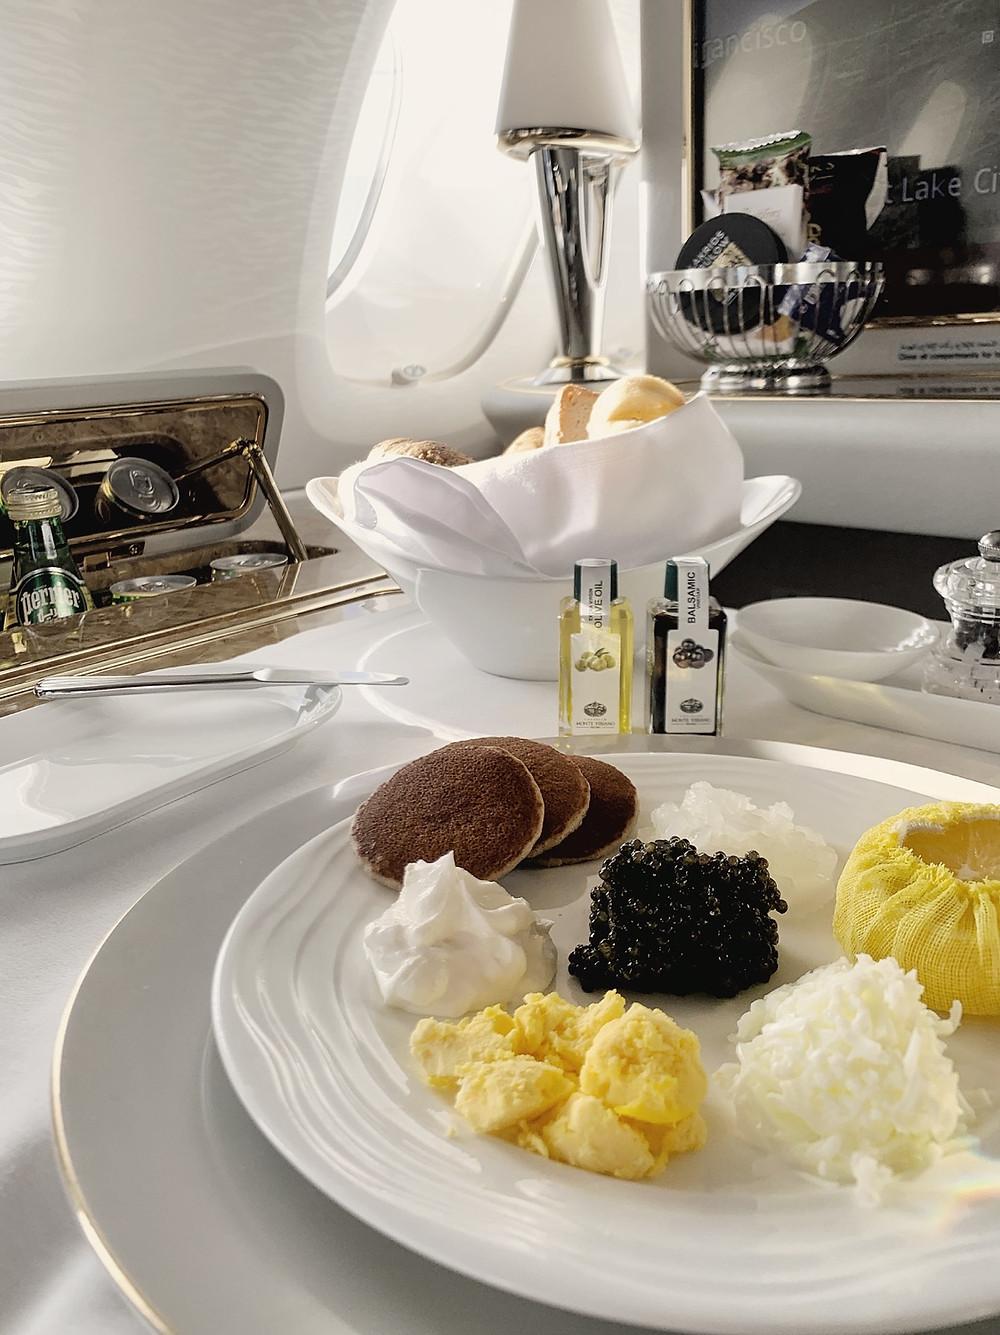 Emirates First Class San Francisco - Dubai, Caviar Service